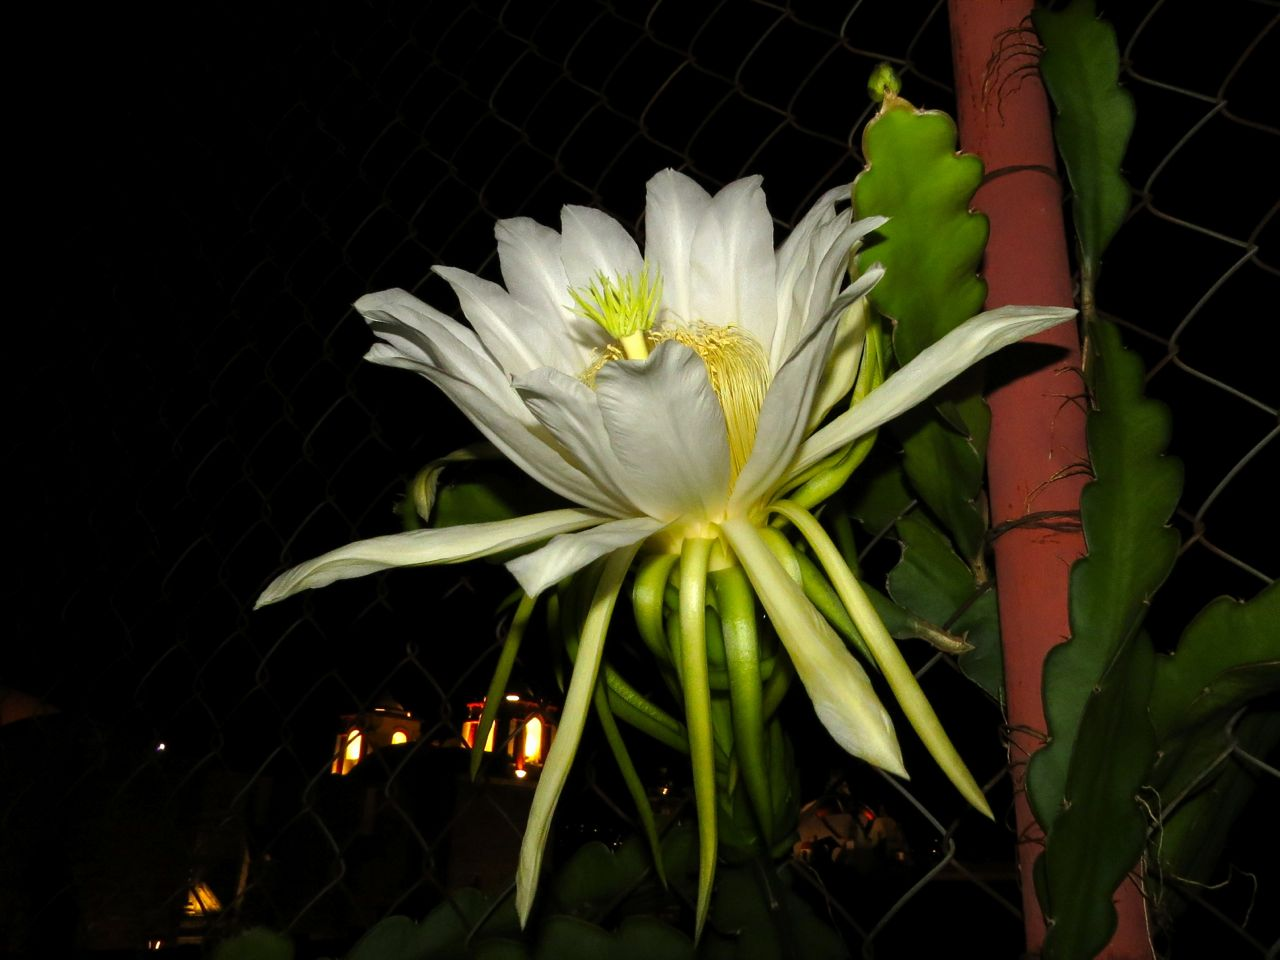 Pitahaya flower, side view